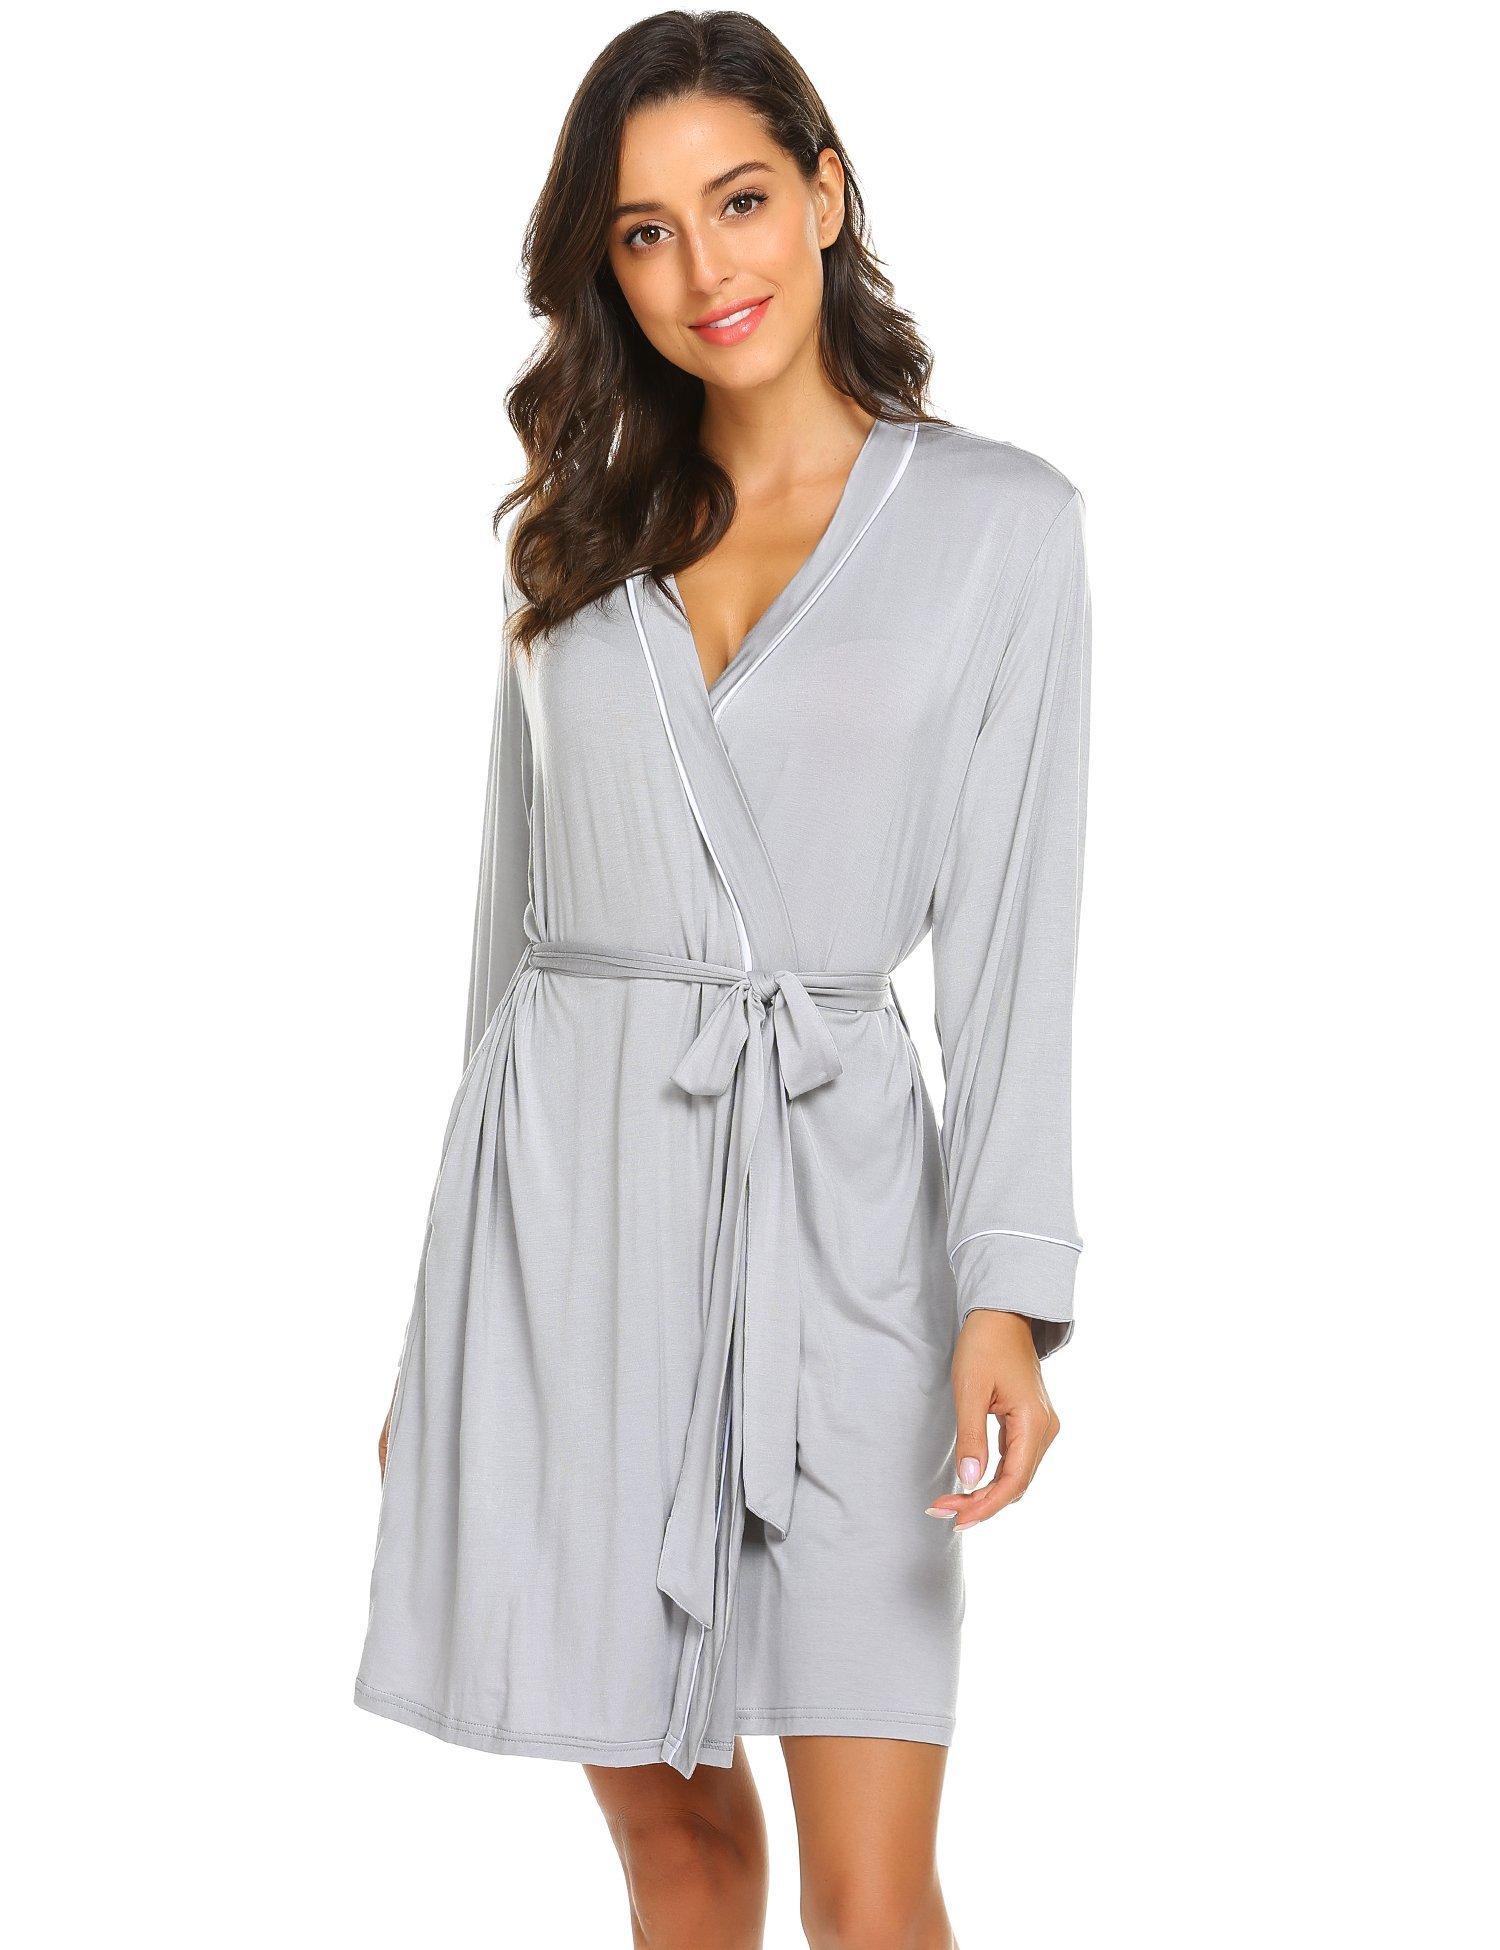 Avidlove Womens Robe Kimono Knit Cotton Light Short Bridesmaids Spa Bathrobe